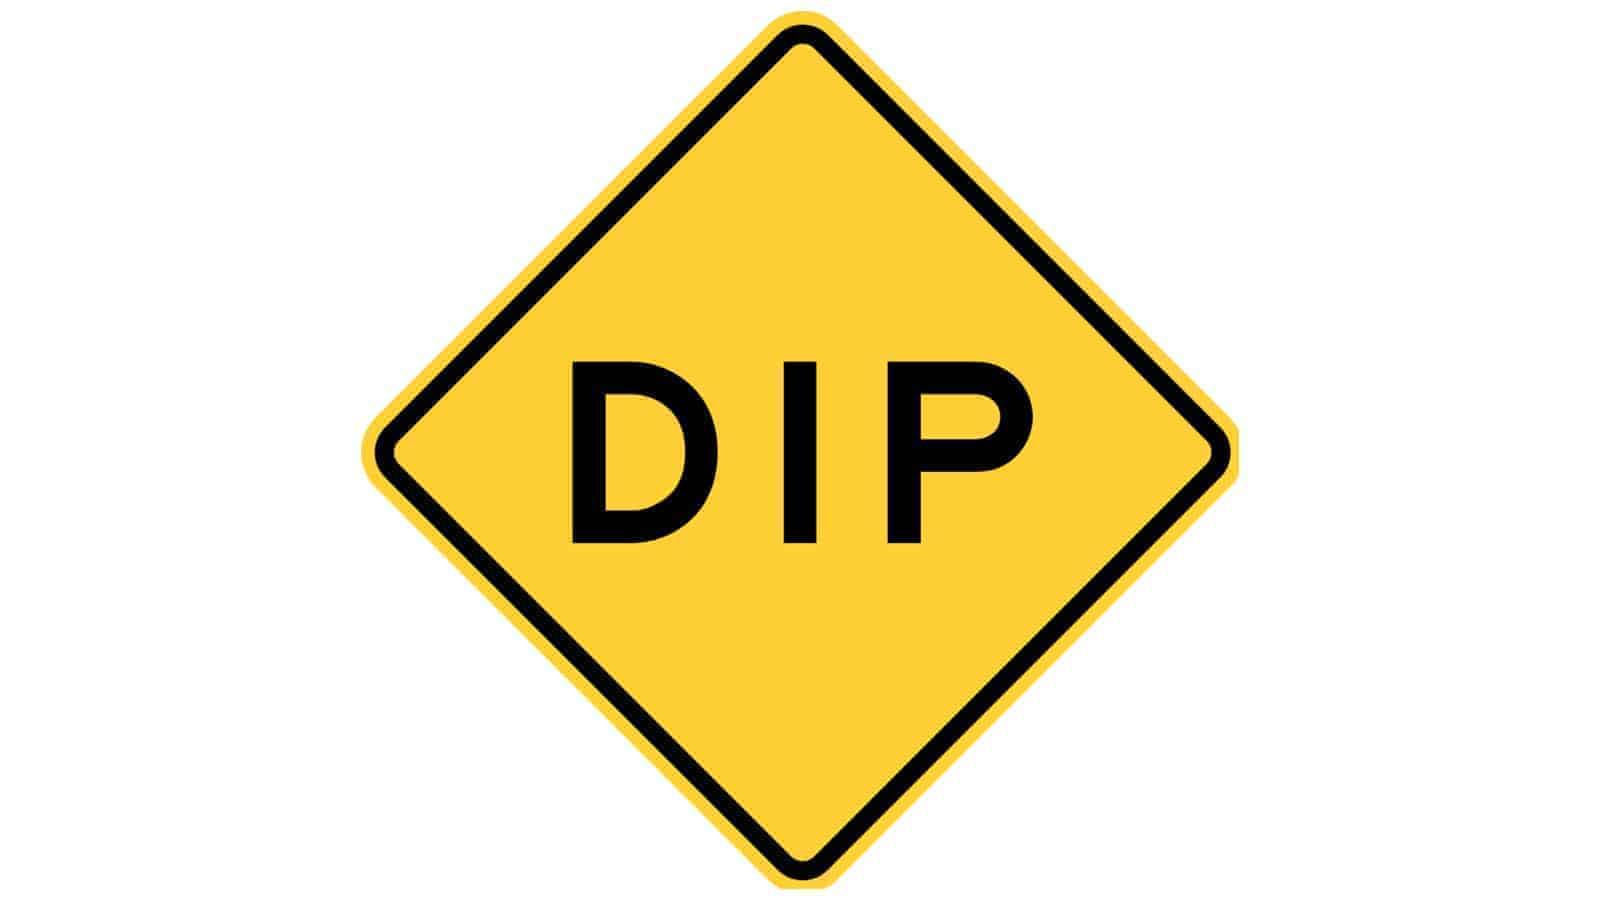 Warning sign Dip Ahead